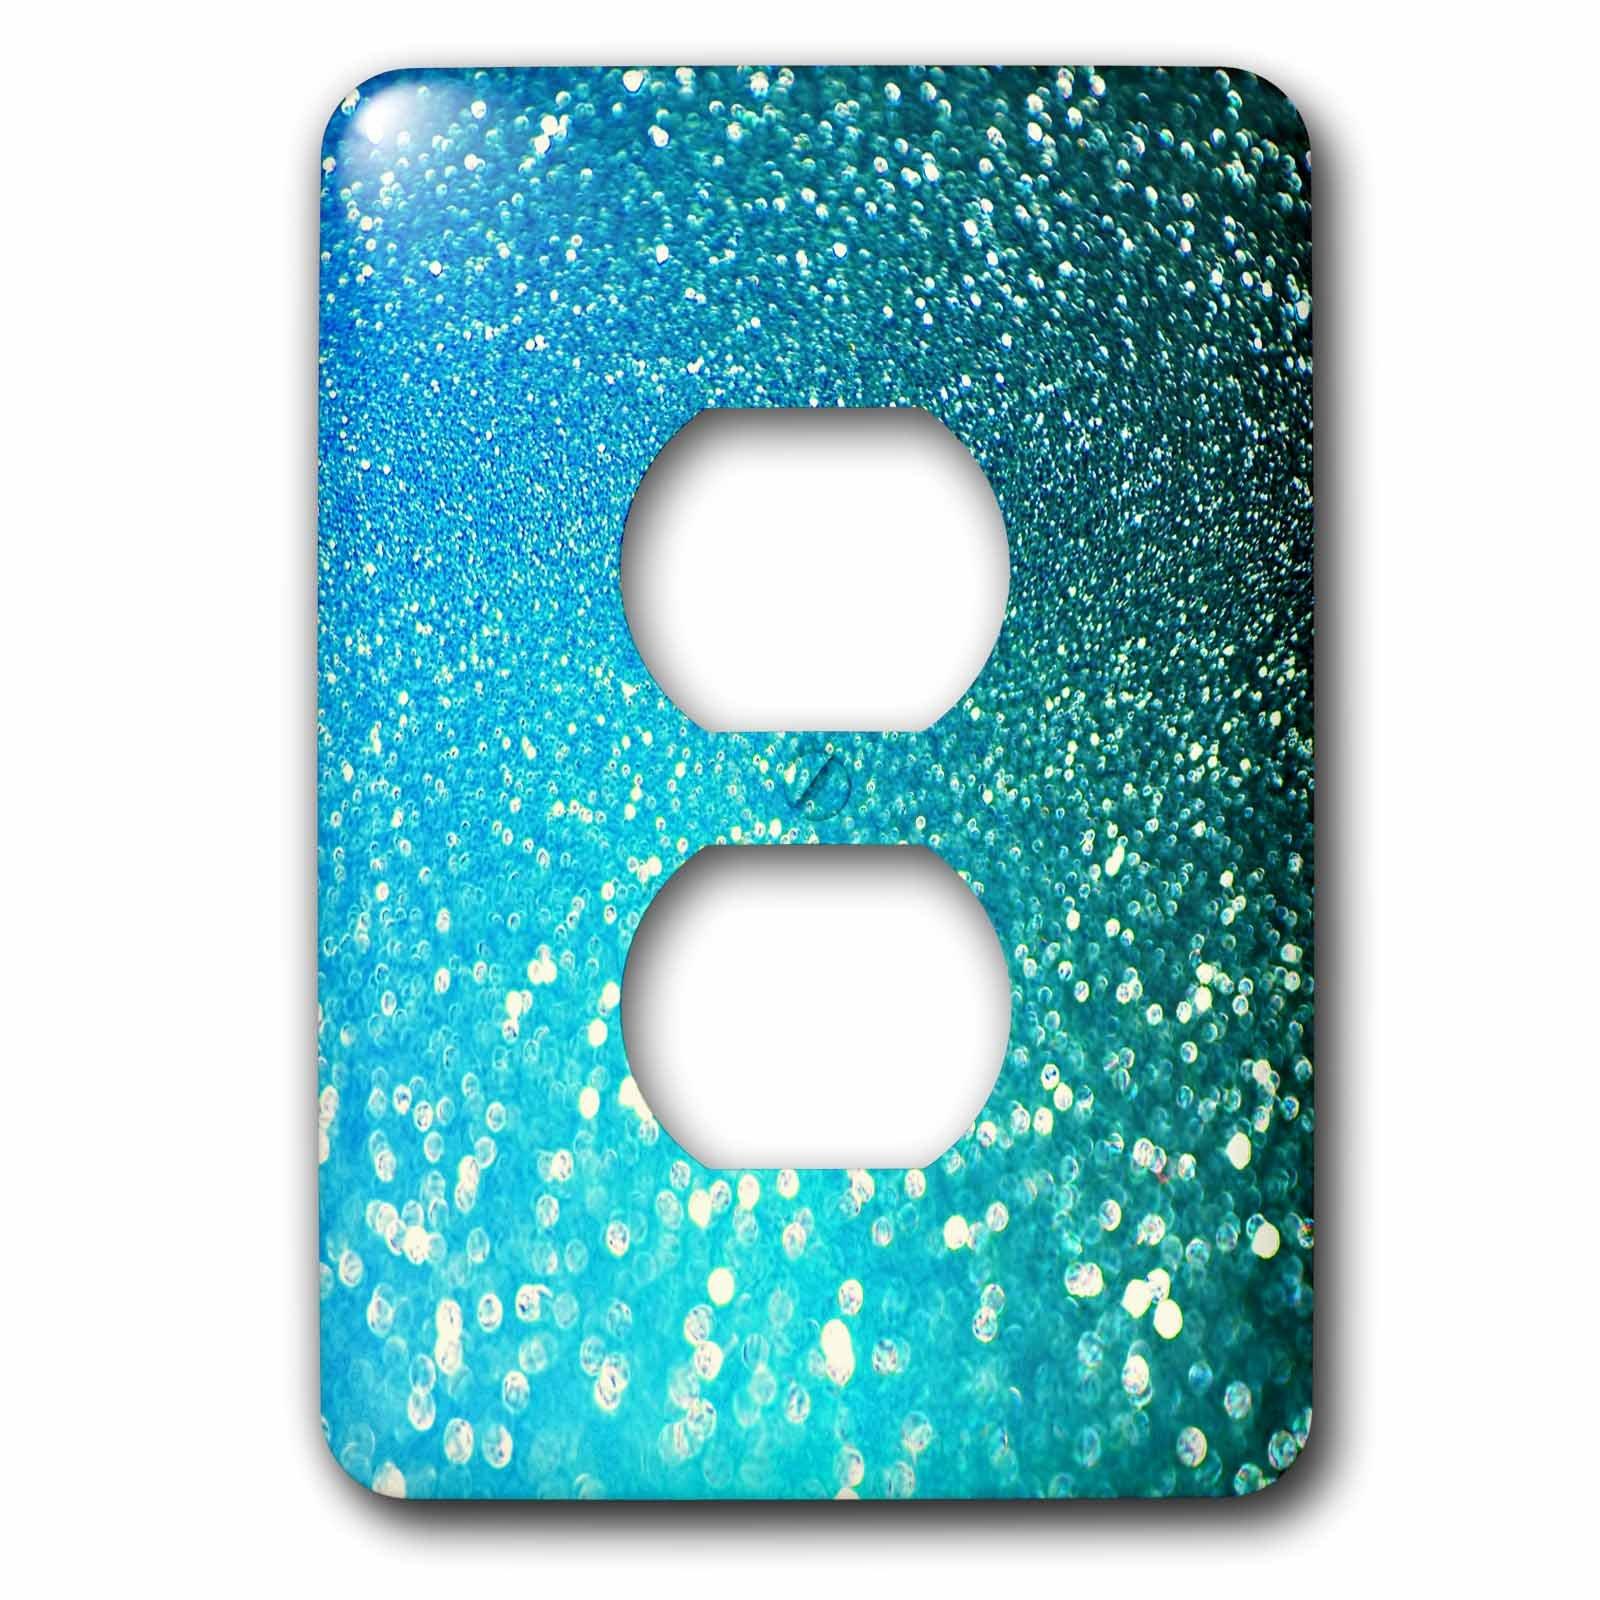 3dRose lsp_267050_6 Sparkling Luxury Elegant Aqua Teal Blue Faux Glitter Effect Artprint Plug Outlet Cover, Multicolor